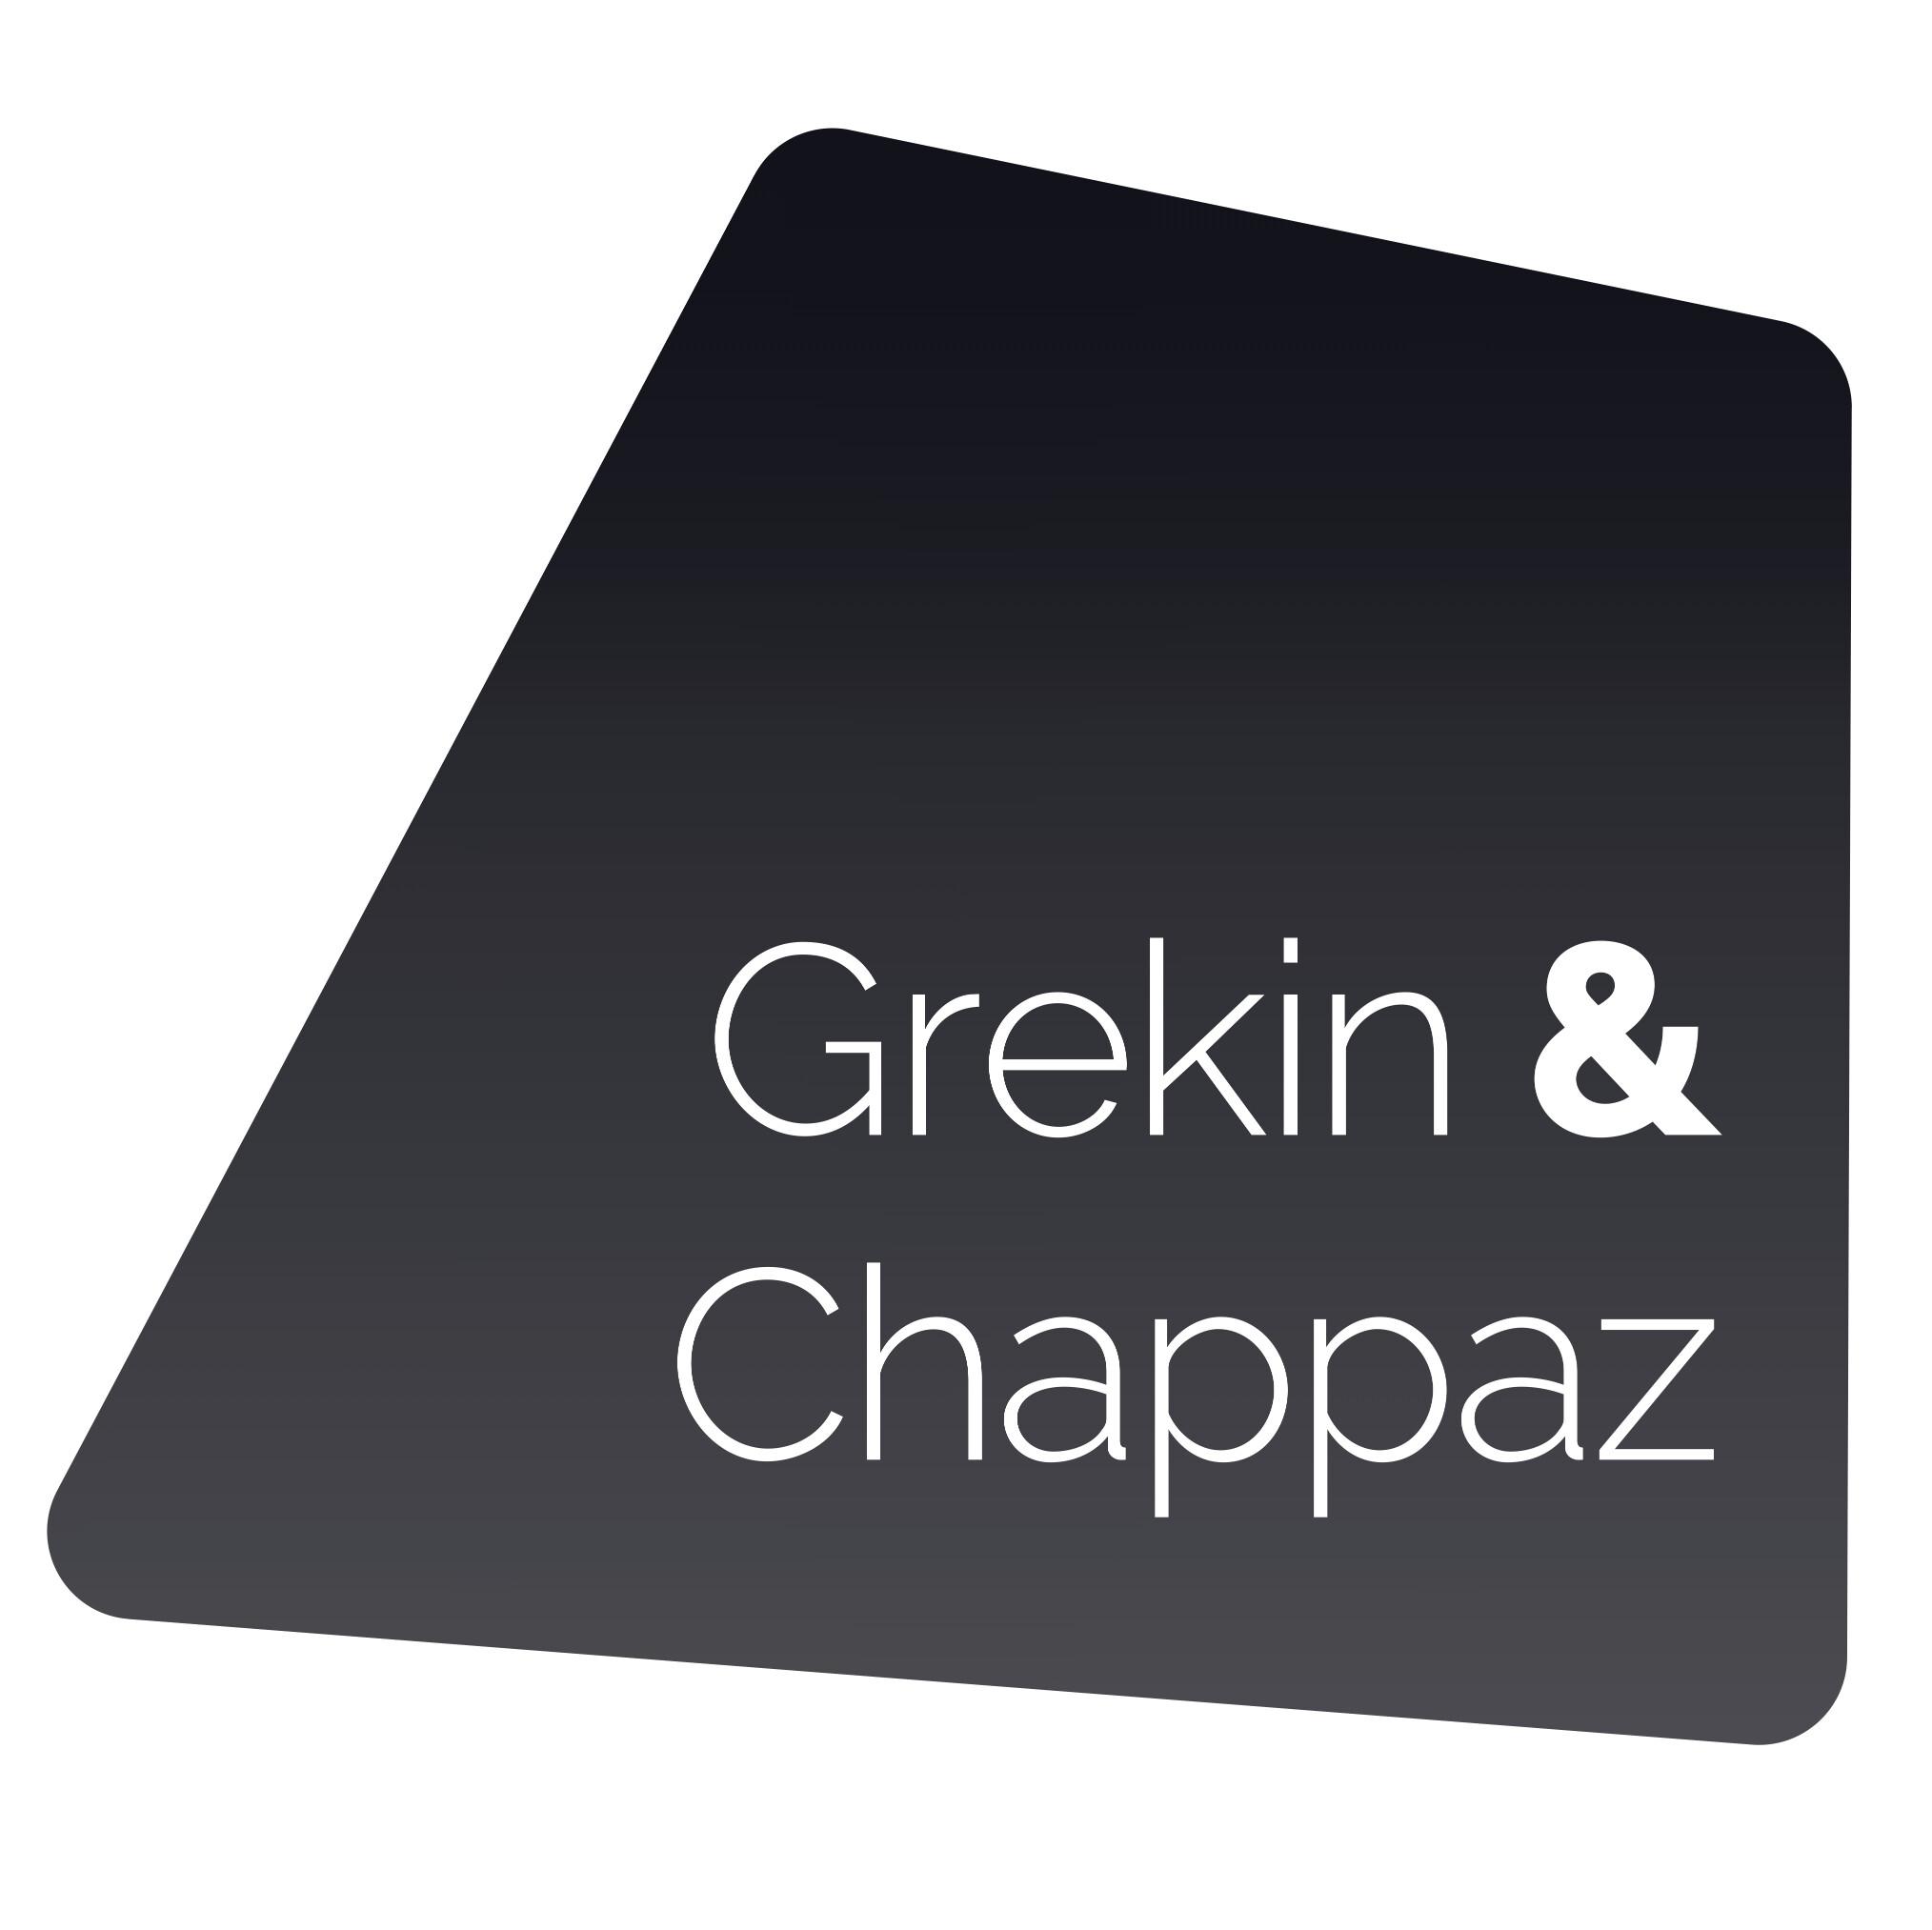 Grekin&Chappaz